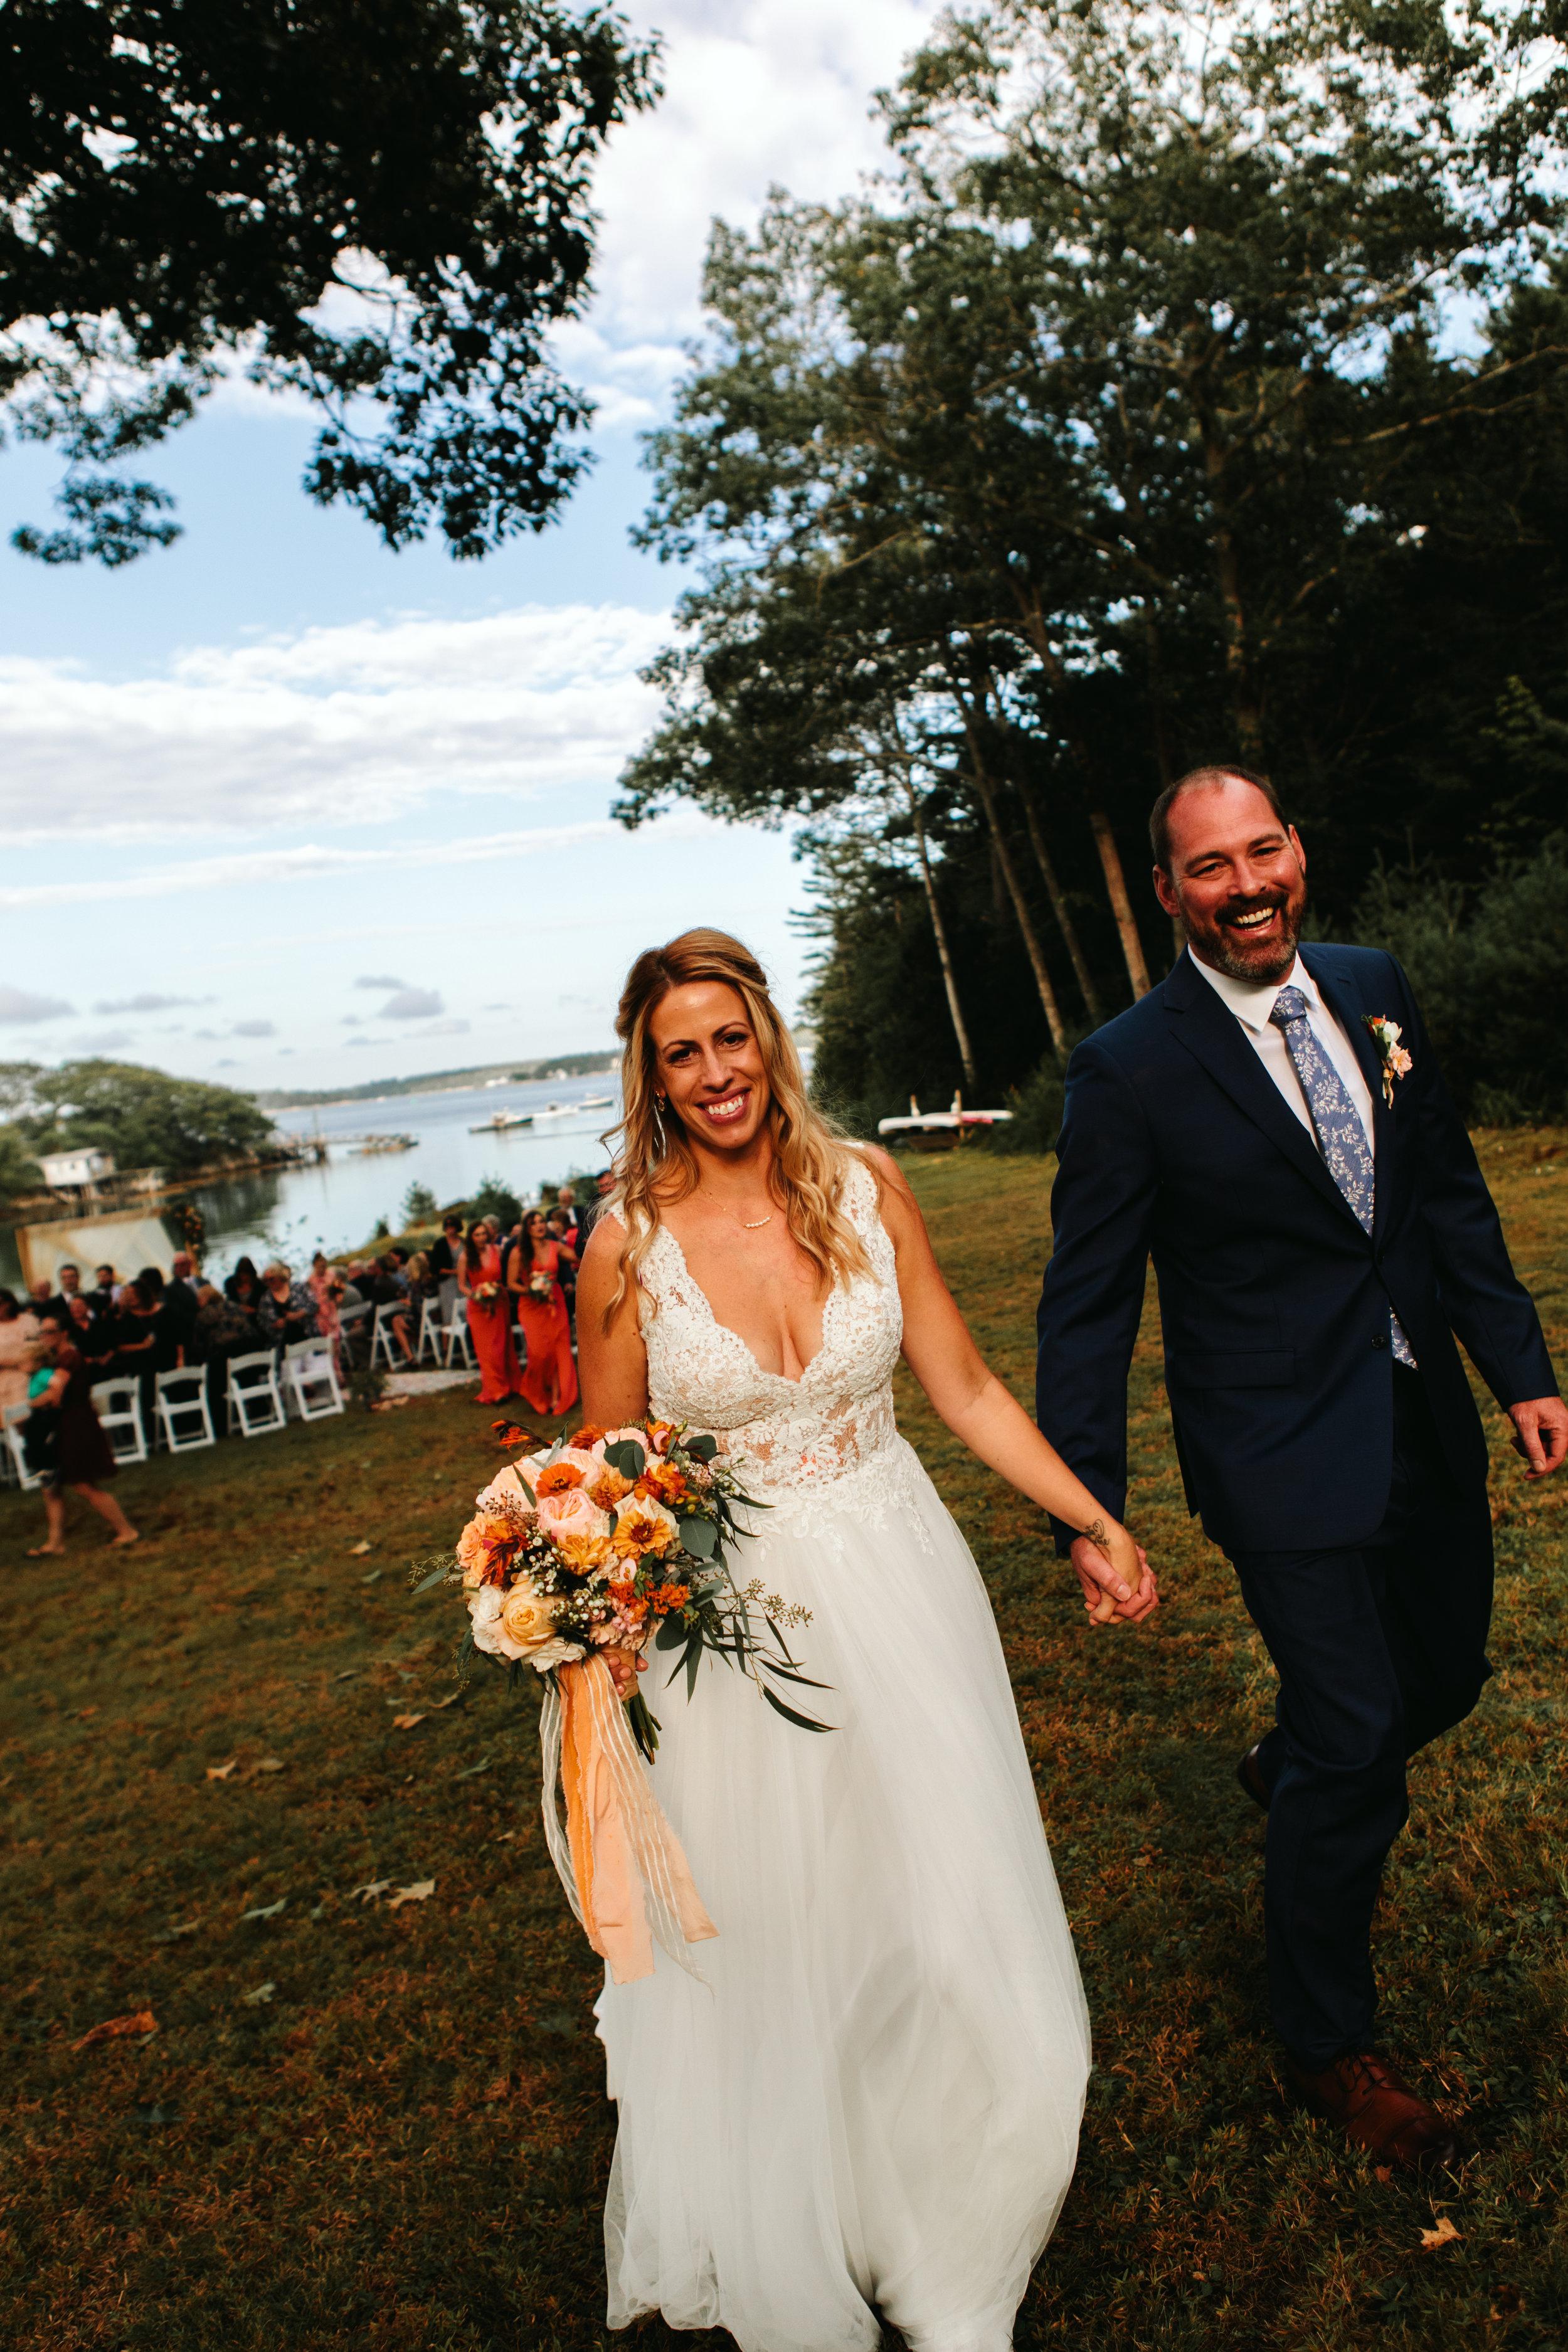 georgetown-maine-wedding-ceremony-30.jpg